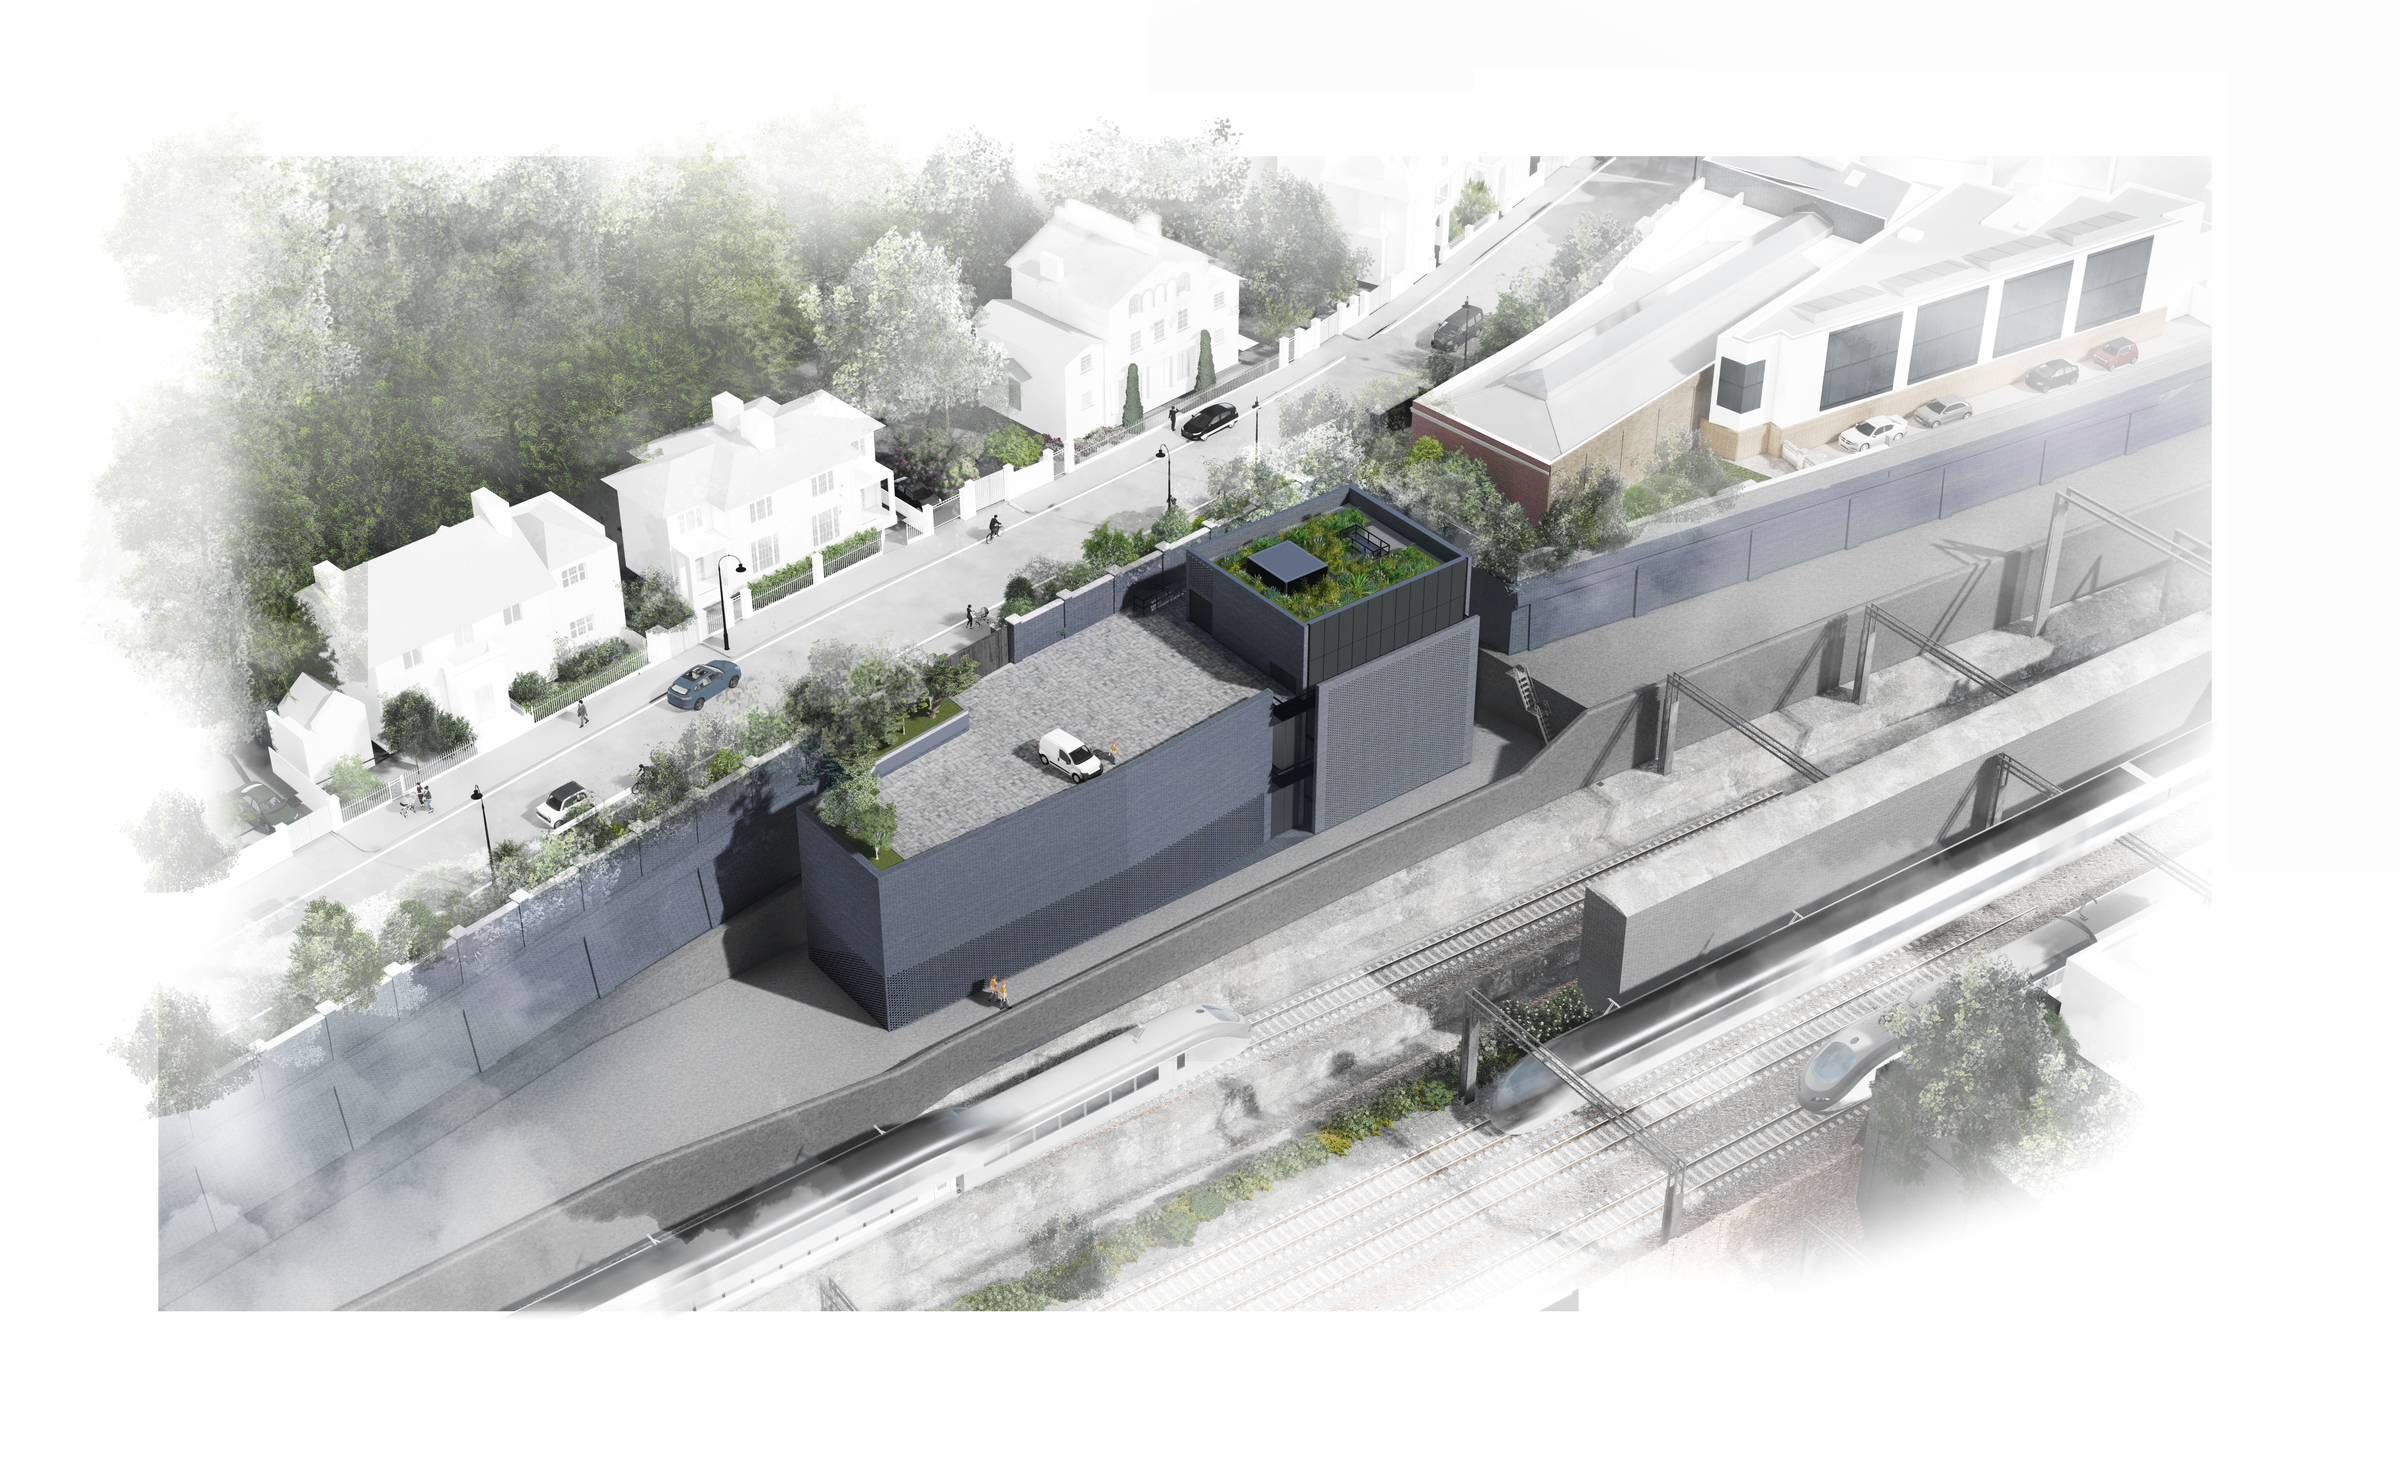 Euston headhouse design HS2